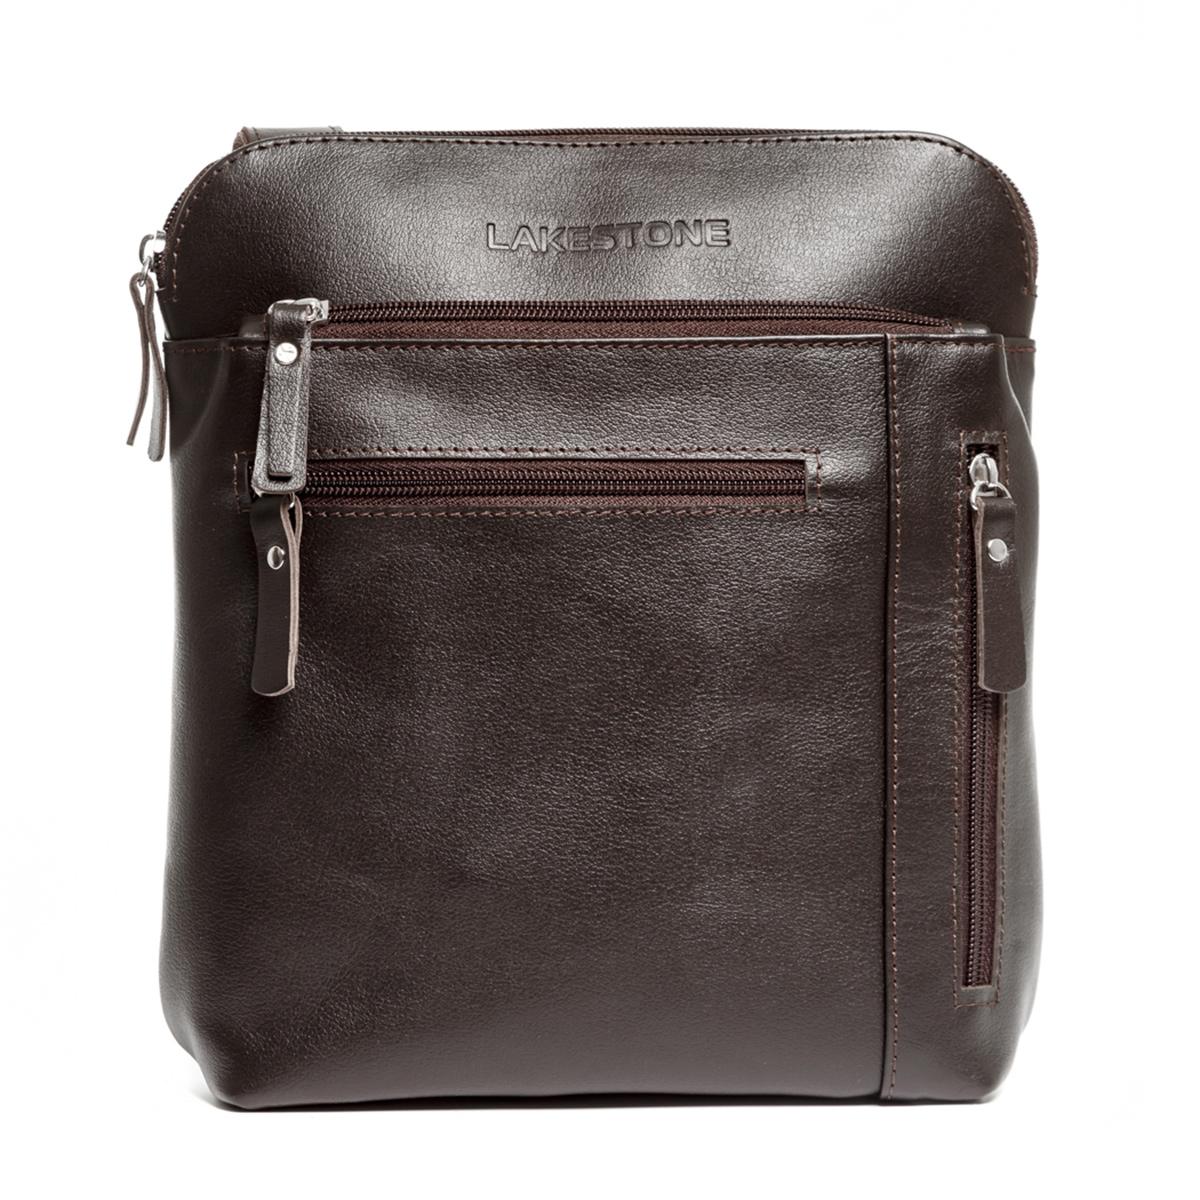 Мужская сумка через плечо Elm Brown фото